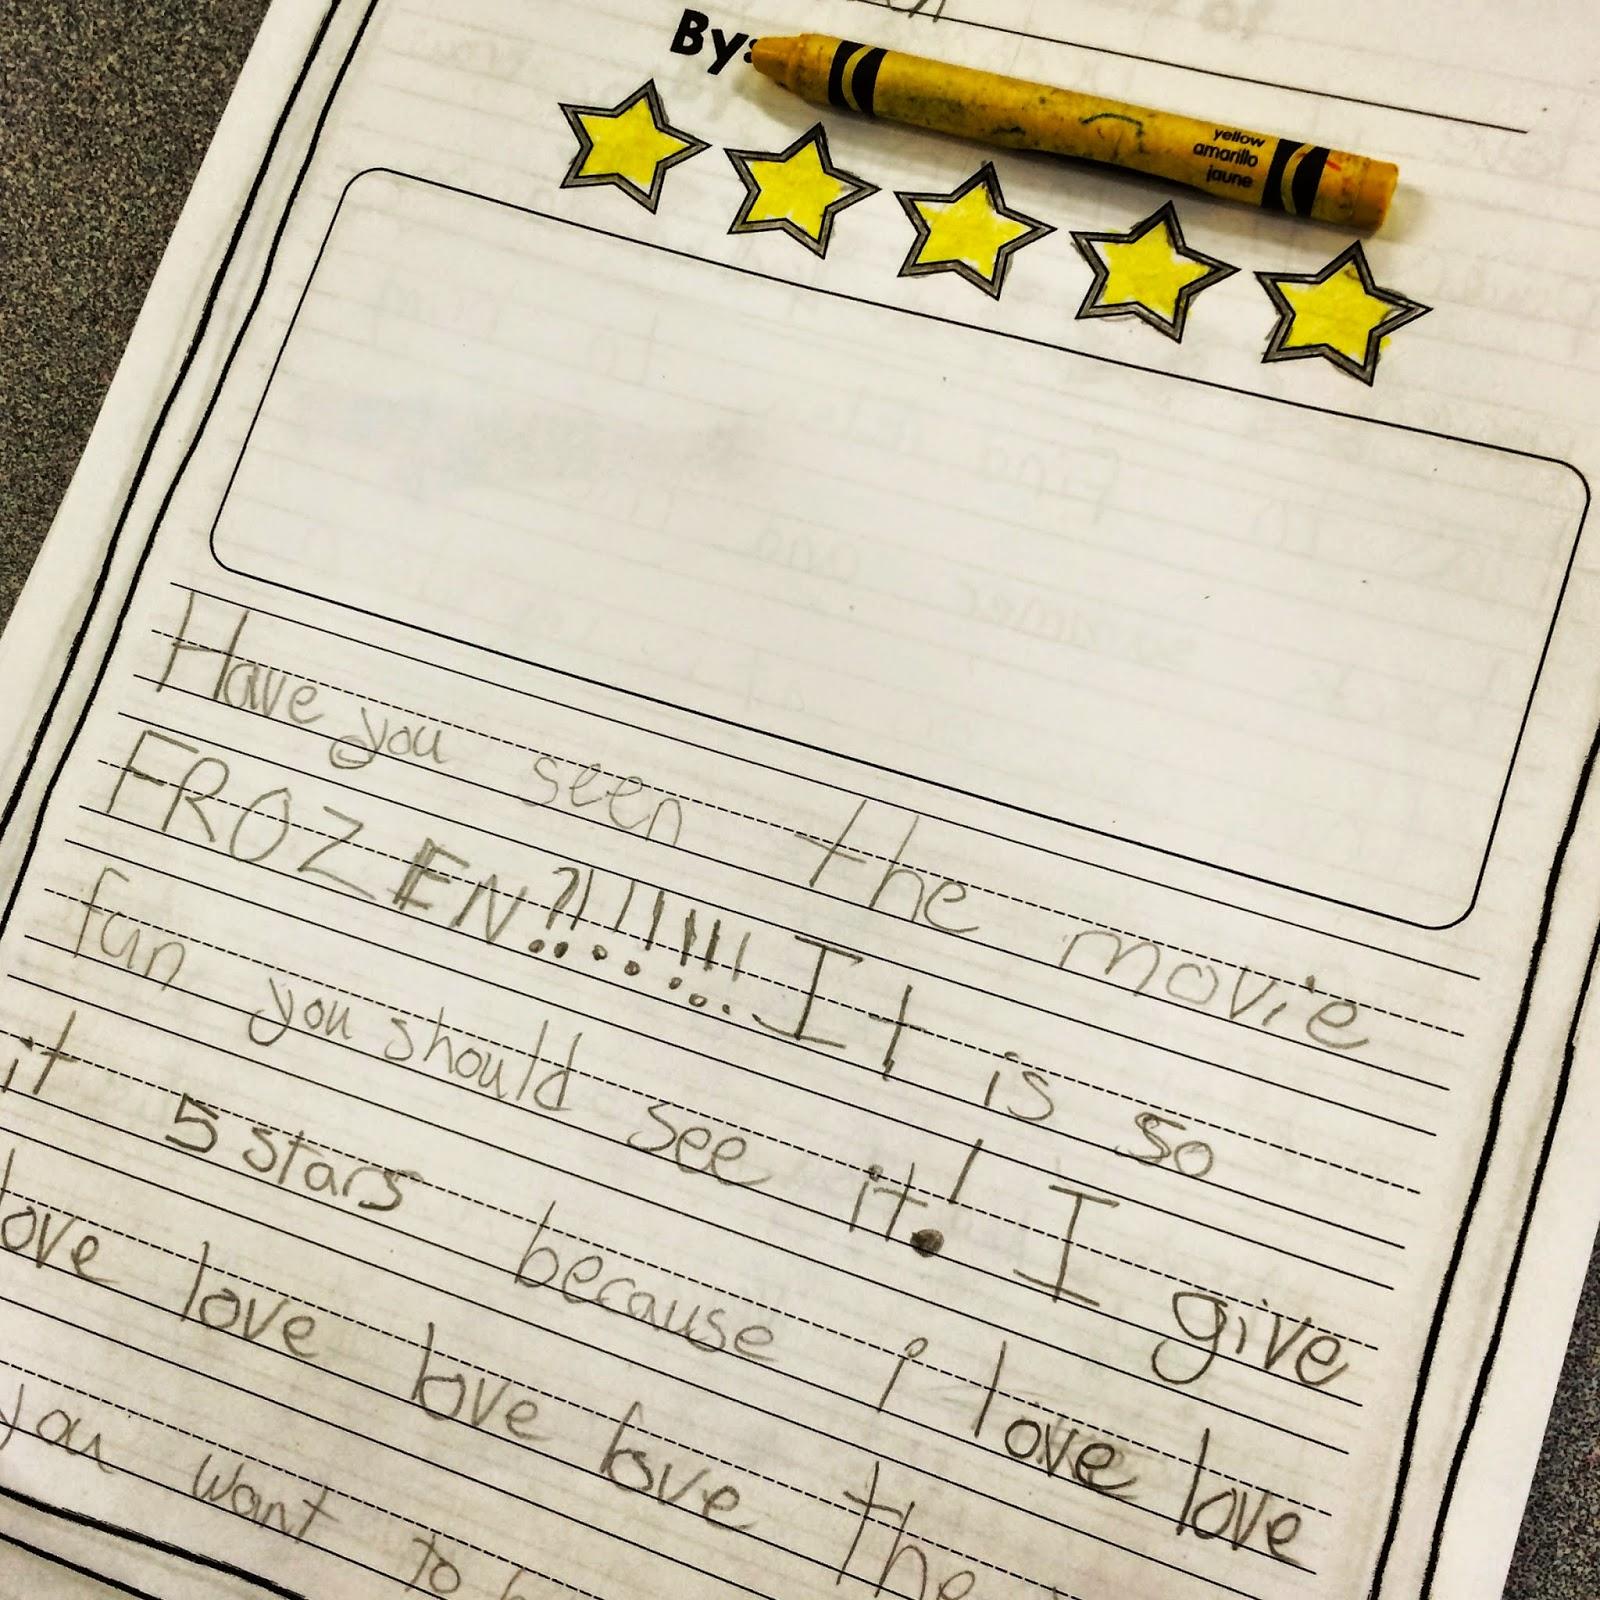 Susan Jones Teaching Writing Reviews In 1st Or 2nd Grade